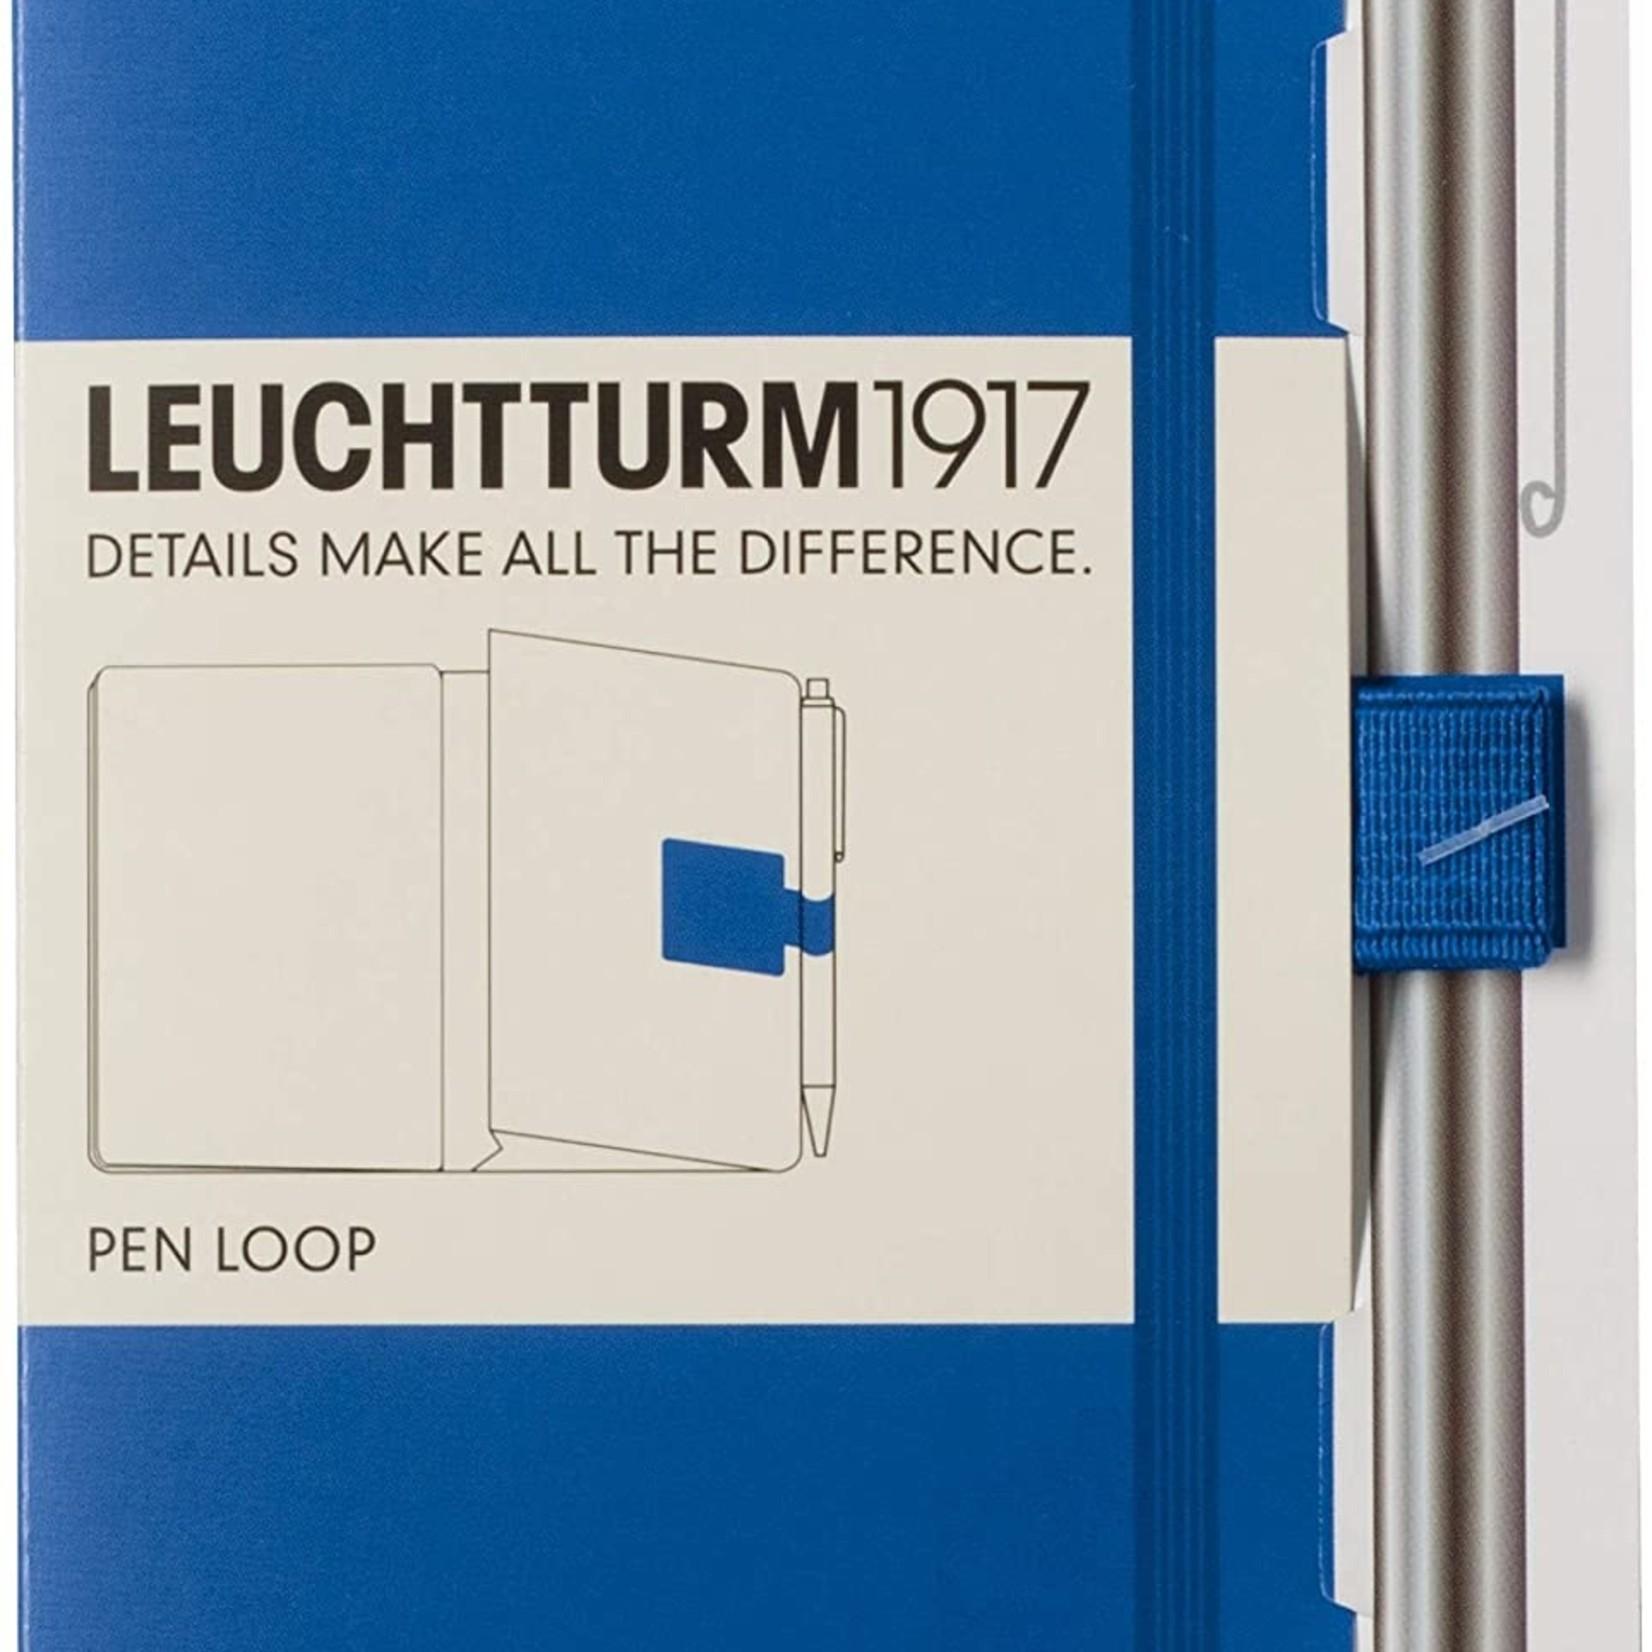 LT PENLOOP Blau-/Grüntöne